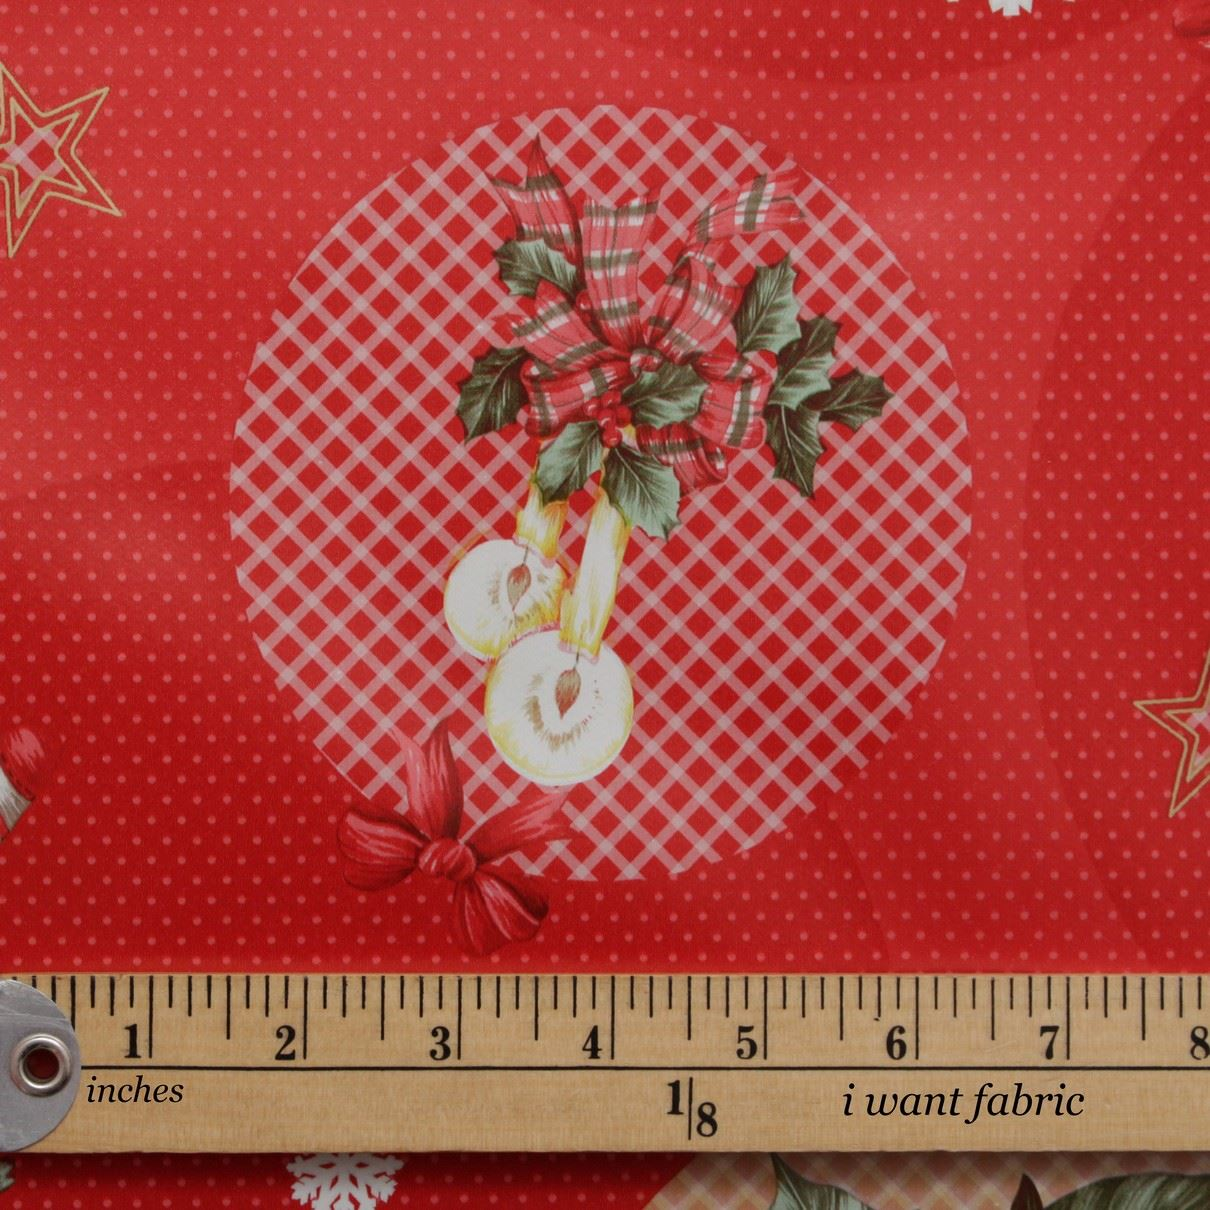 thumbnail 4 - CHRISTMAS PVC OILCLOTH VINYL FABRIC XMAS KITCHEN TABLE WIPECLEAN TABLECLOTHS